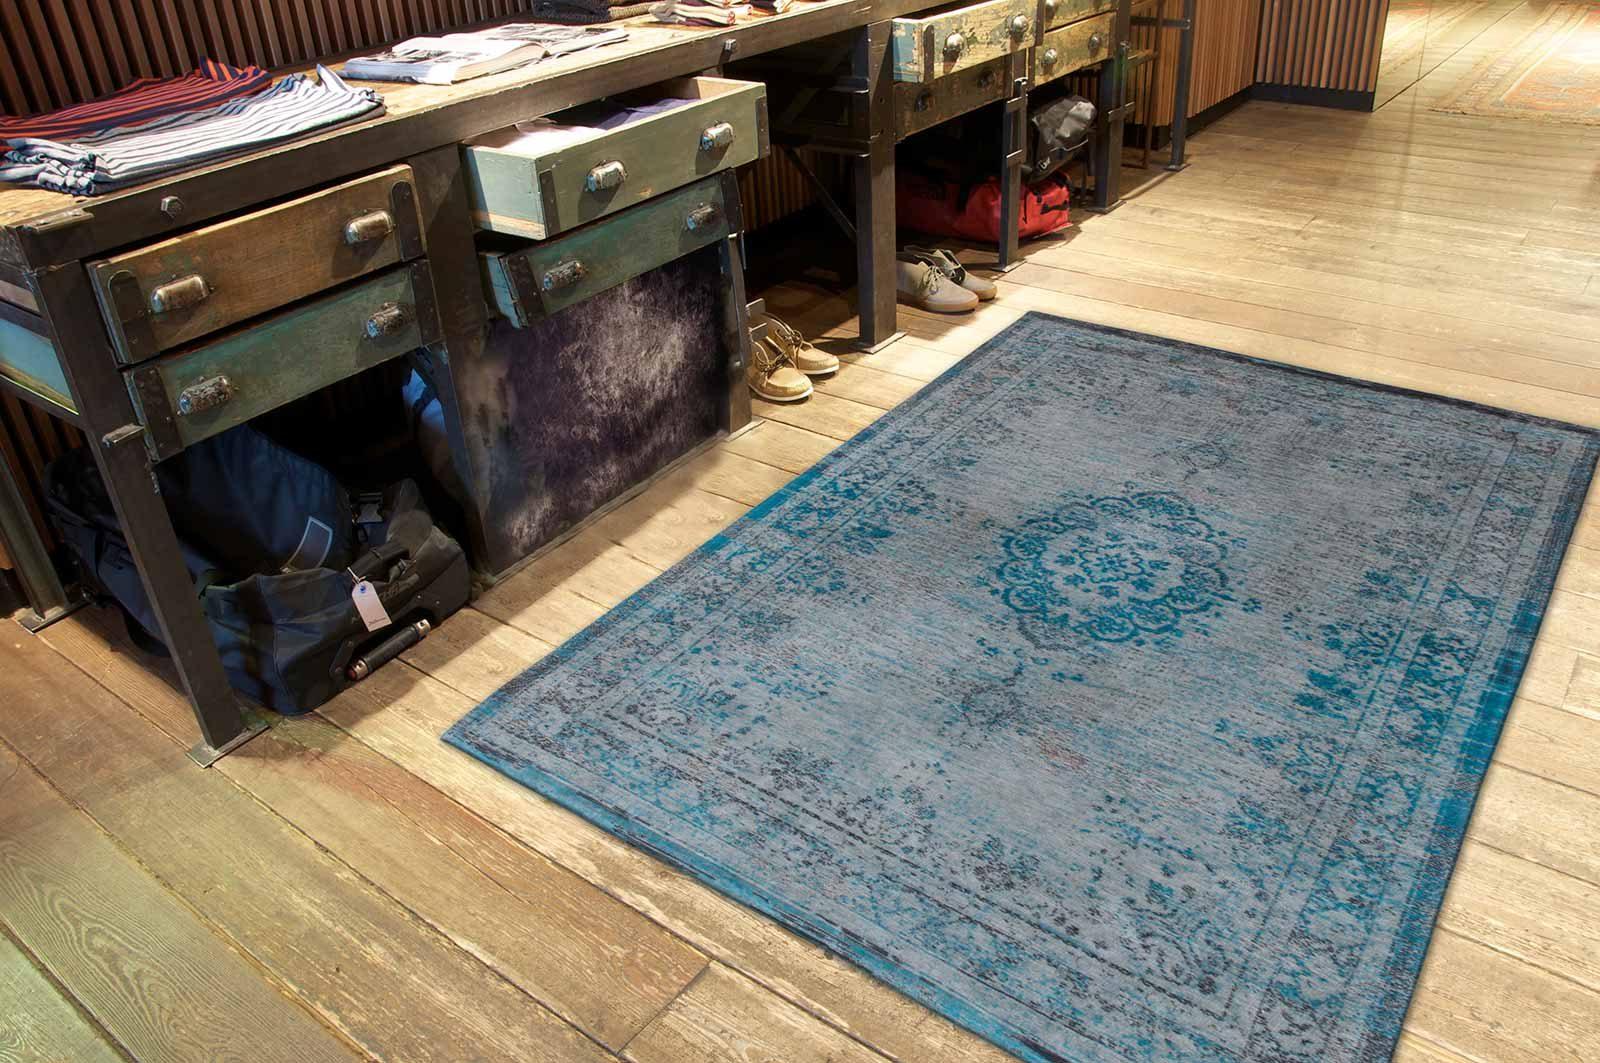 alfombras Louis De Poortere LX8255 Fading World Medaillon Grey Turquoise interior 2